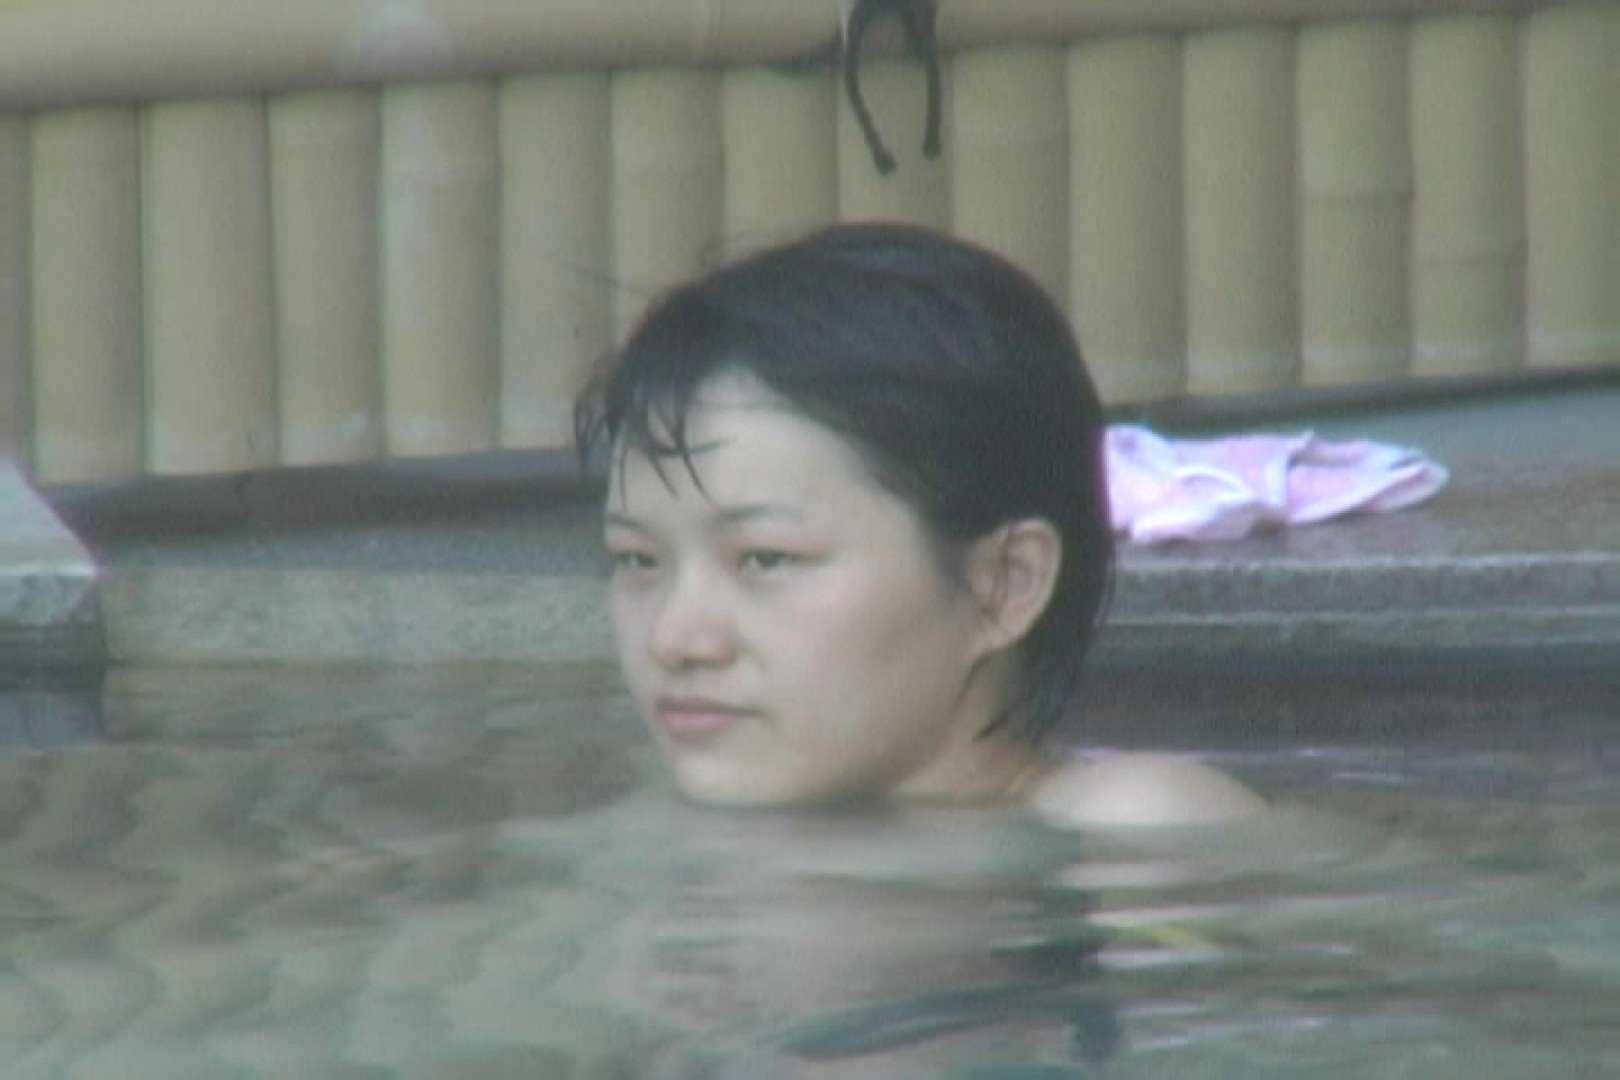 Aquaな露天風呂Vol.116 露天風呂編 | 盗撮シリーズ  107PIX 79